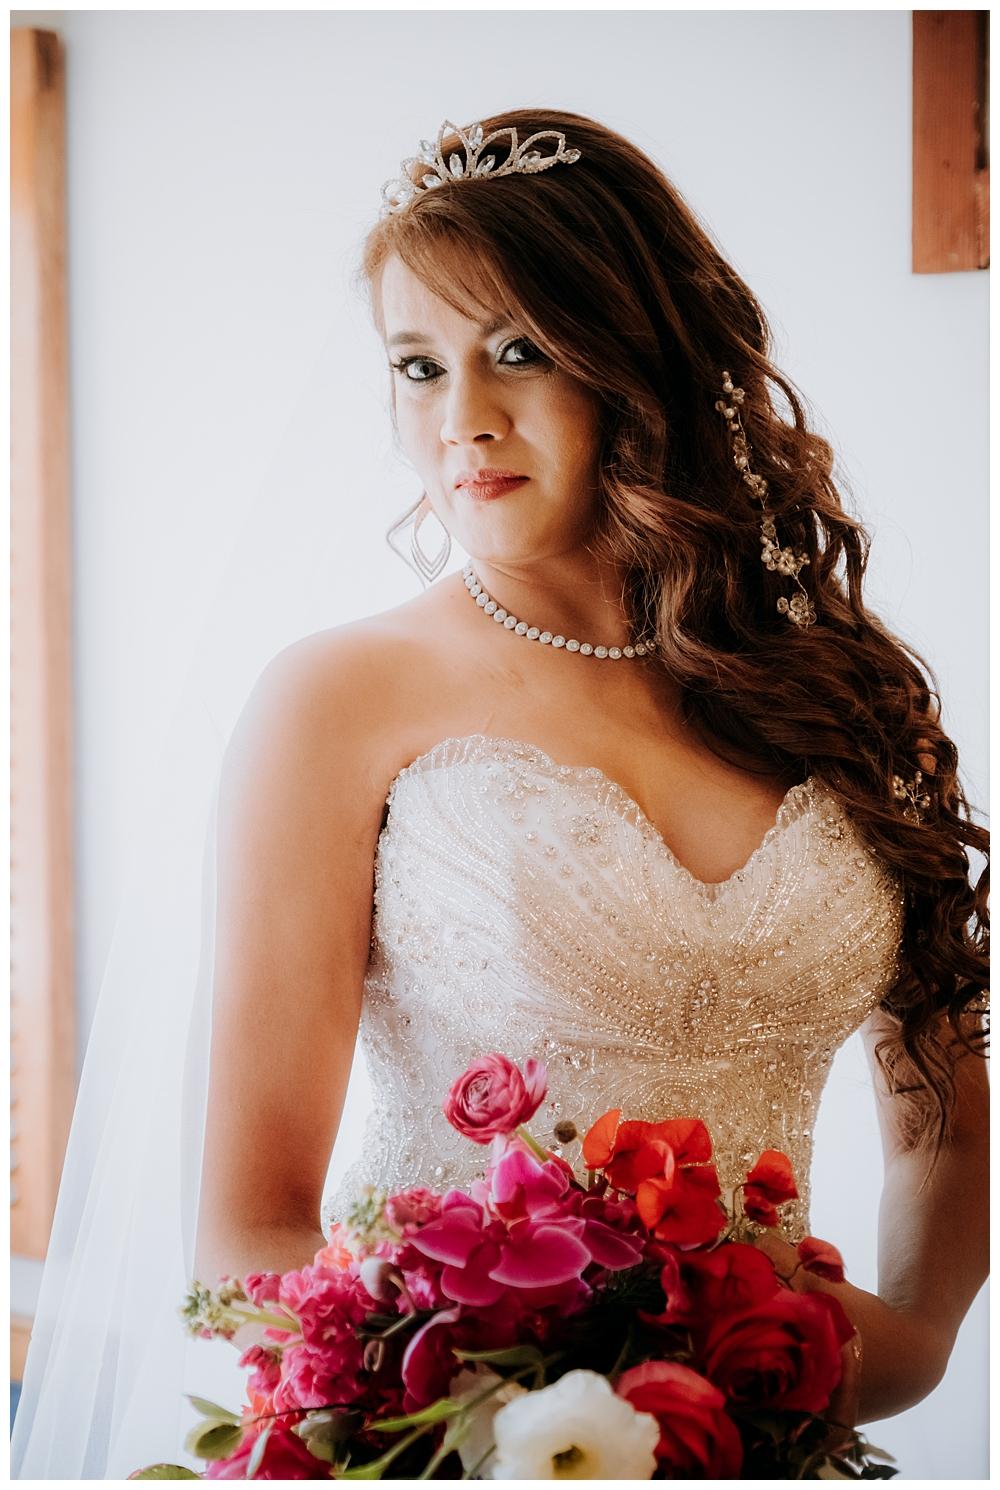 Best_Wedding_Photographer_AlexanderSmith_1787.jpg